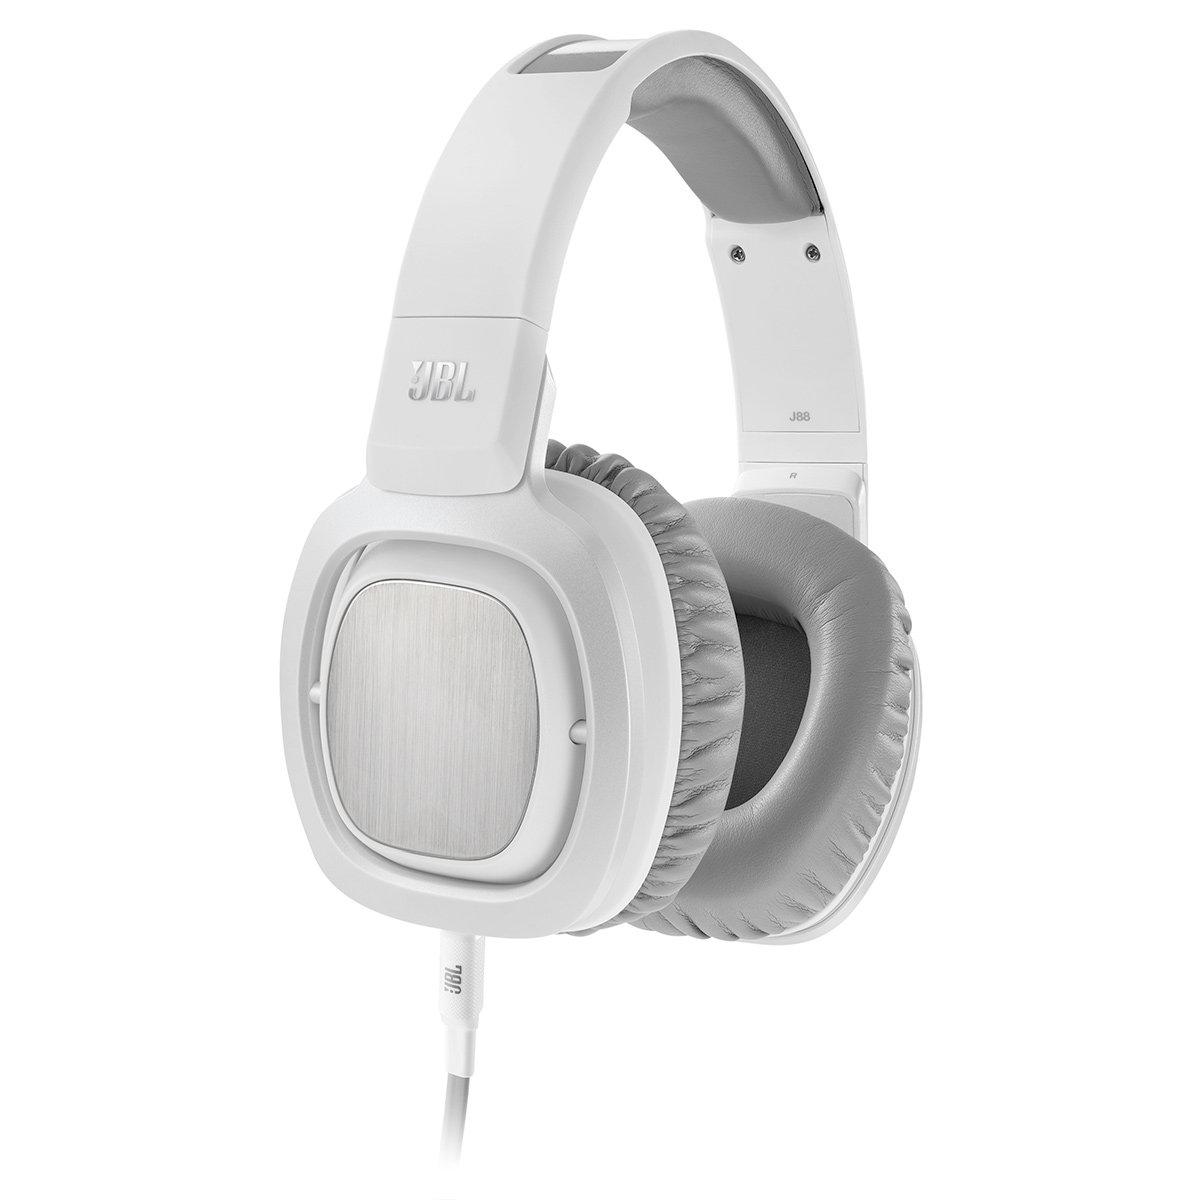 68ee11999df Amazon.com: JBL J88i Premium Over-Ear Headphones with JBL Drivers ...